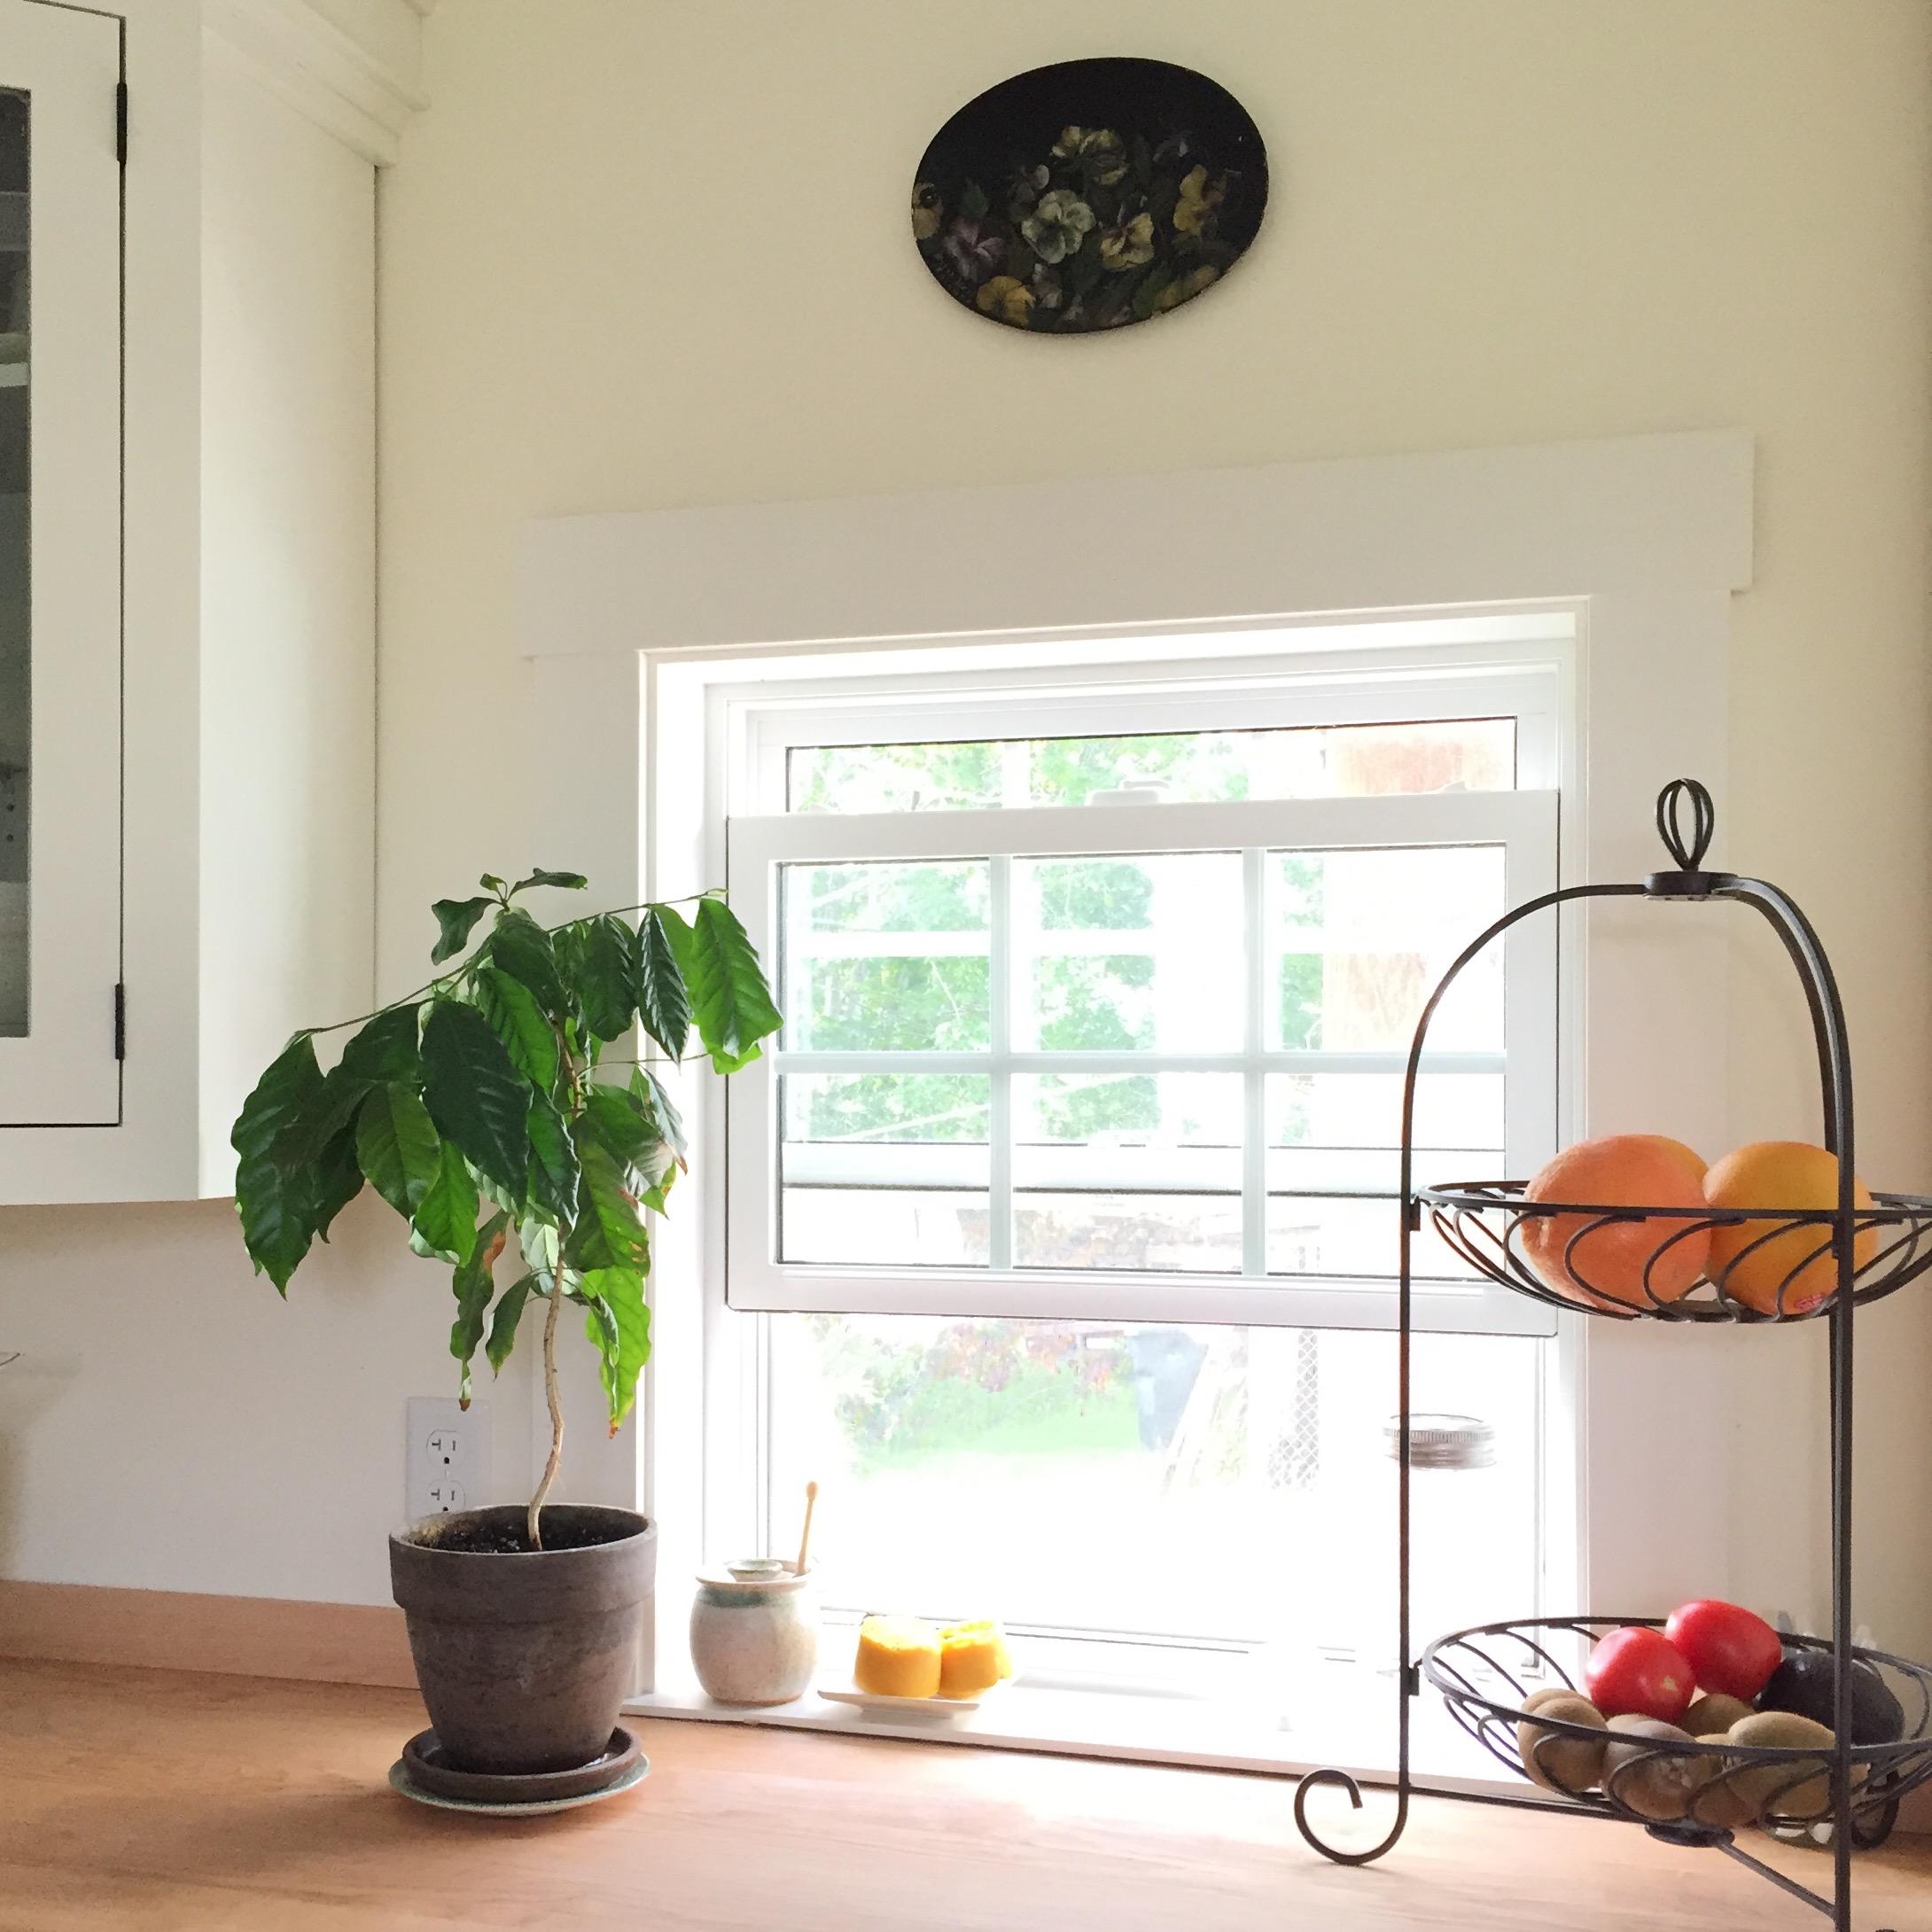 north window in kitchen after